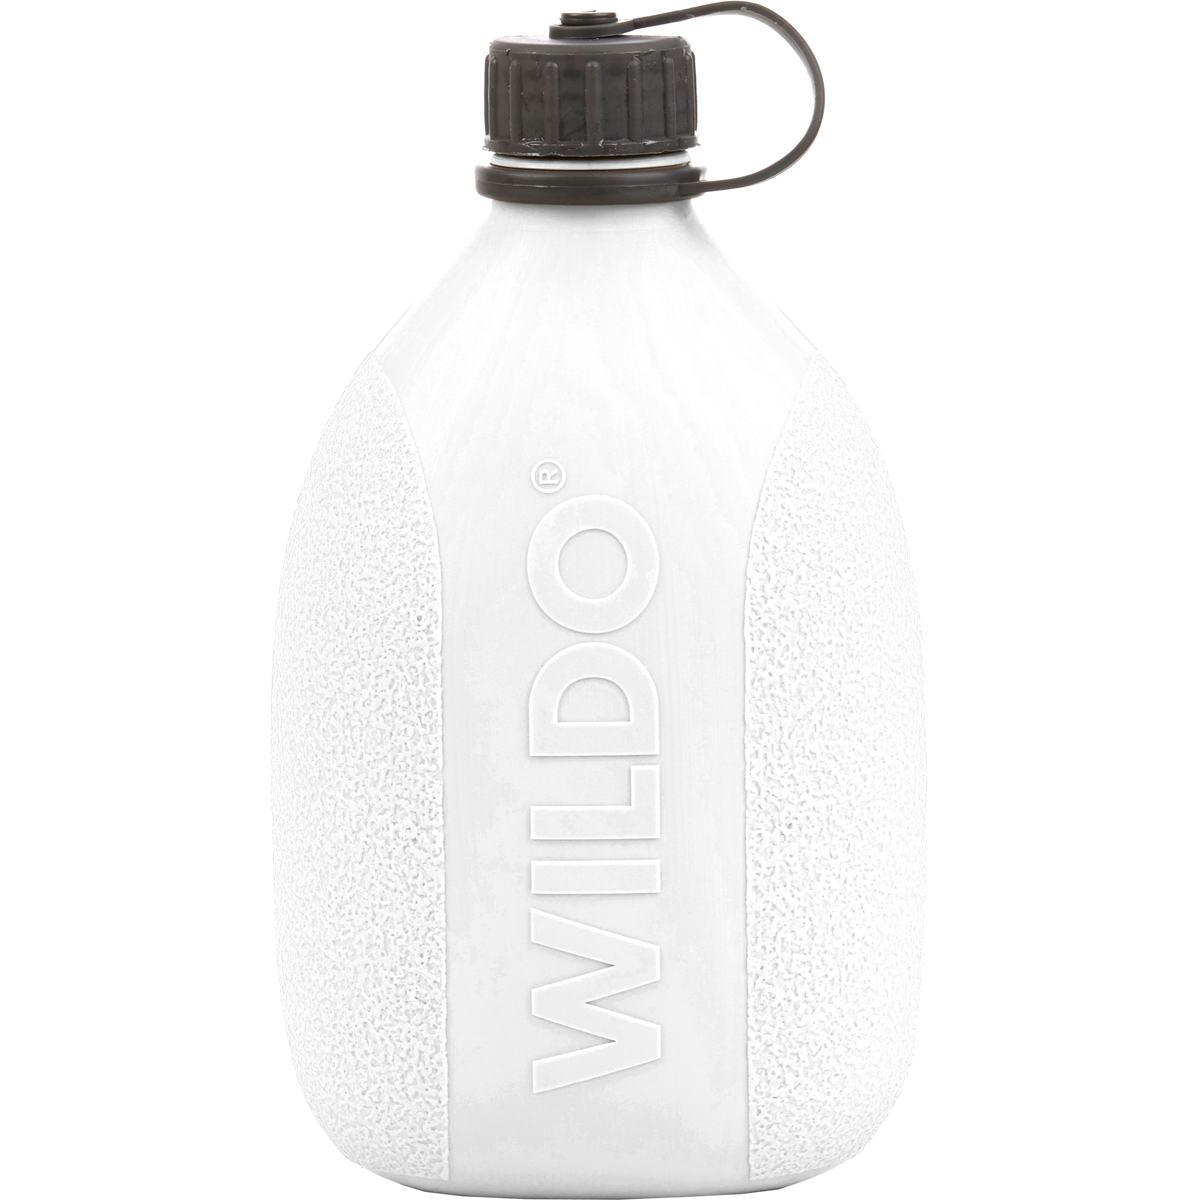 Фляга WILDO® HIKER BOTTLE WHITE, 4119 - артикул: 660260170